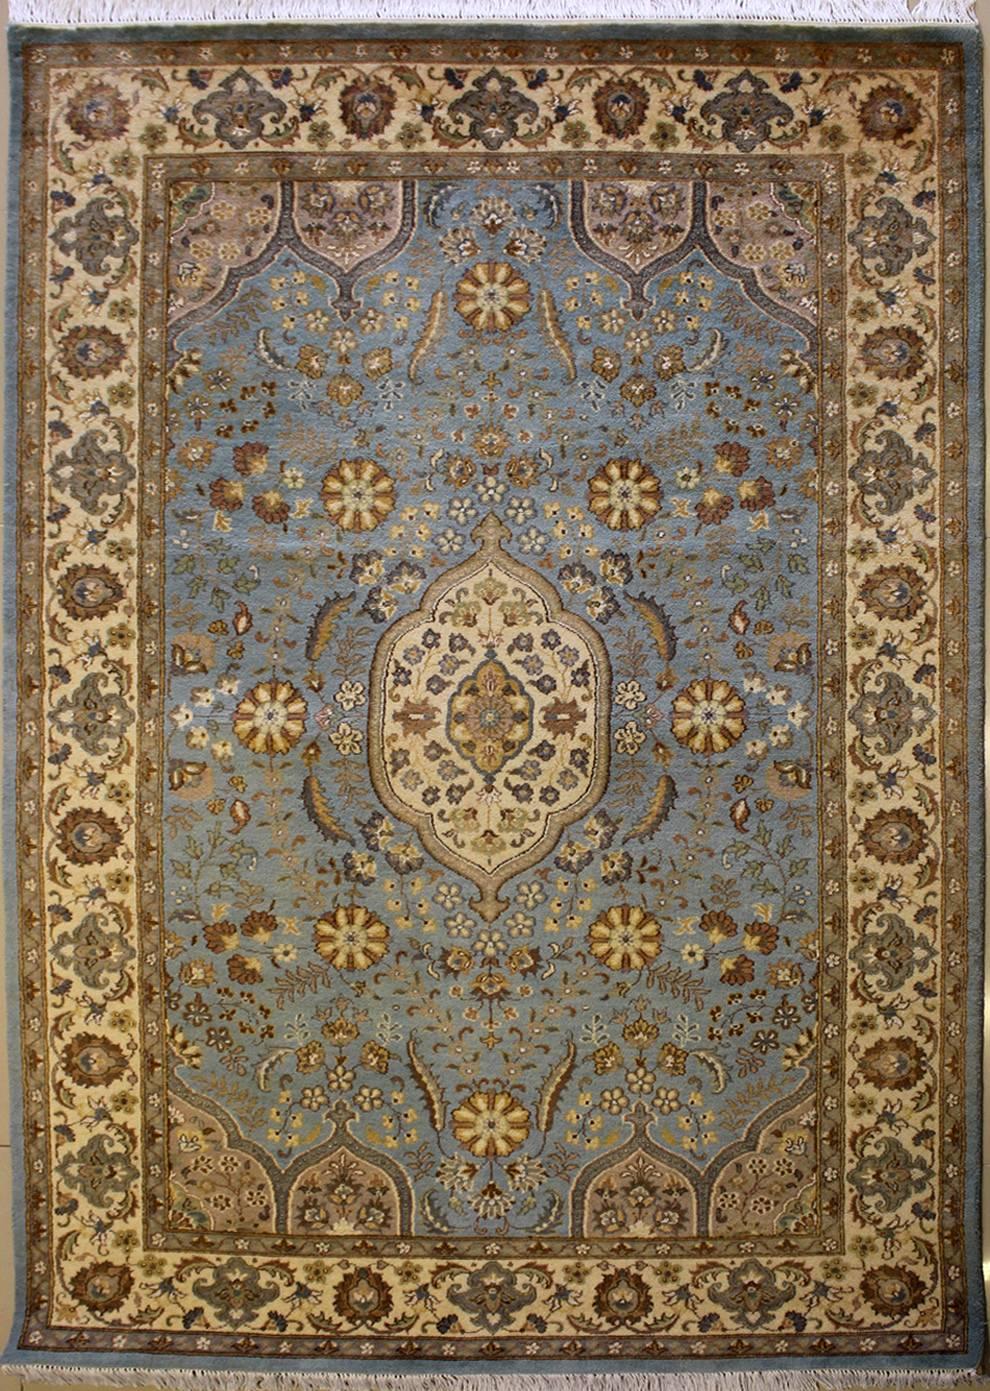 5 39 0x8 39 5 Rug Floral Handmade Pak Persian High Quality